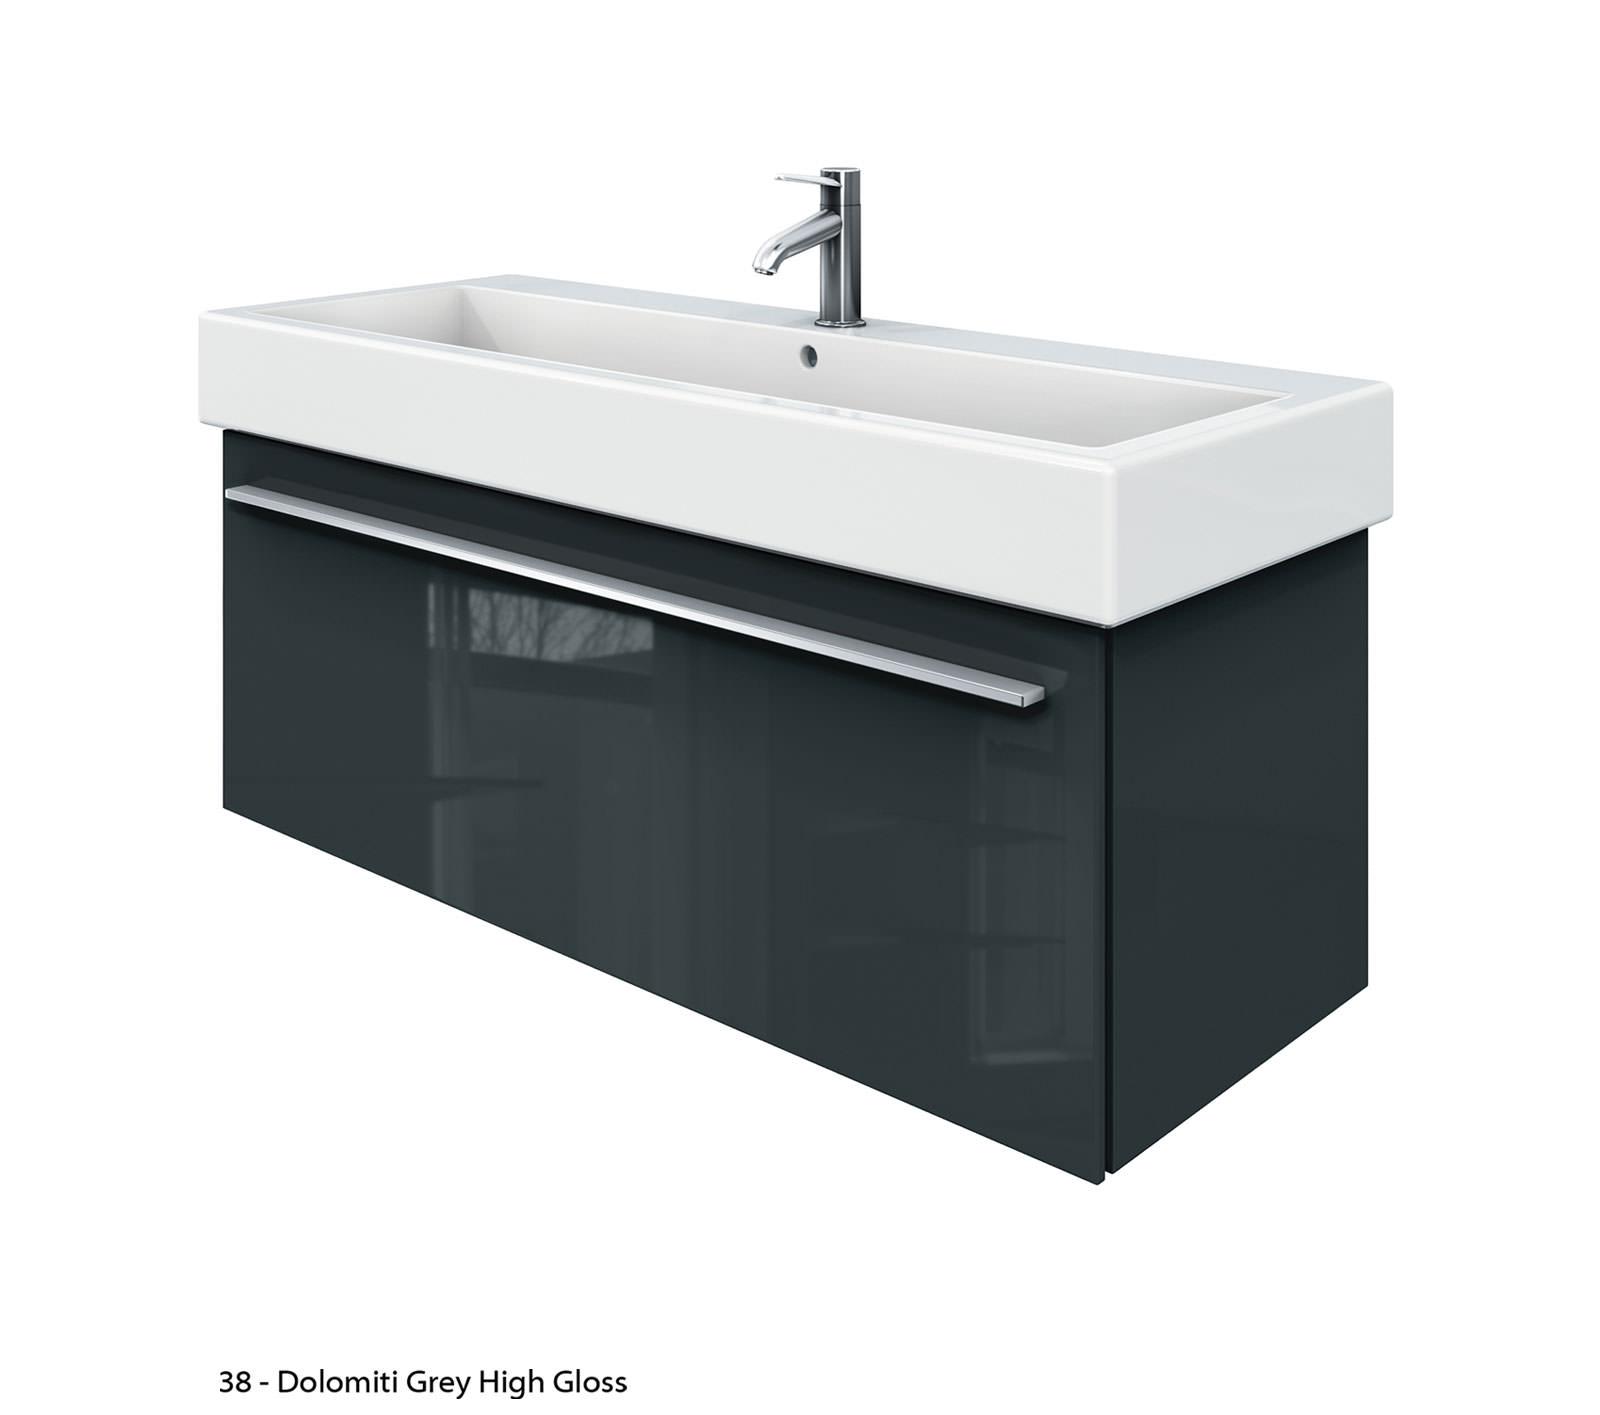 duravit x large 1150mm vanity unit with 1200mm vero washbasin xl6047. Black Bedroom Furniture Sets. Home Design Ideas